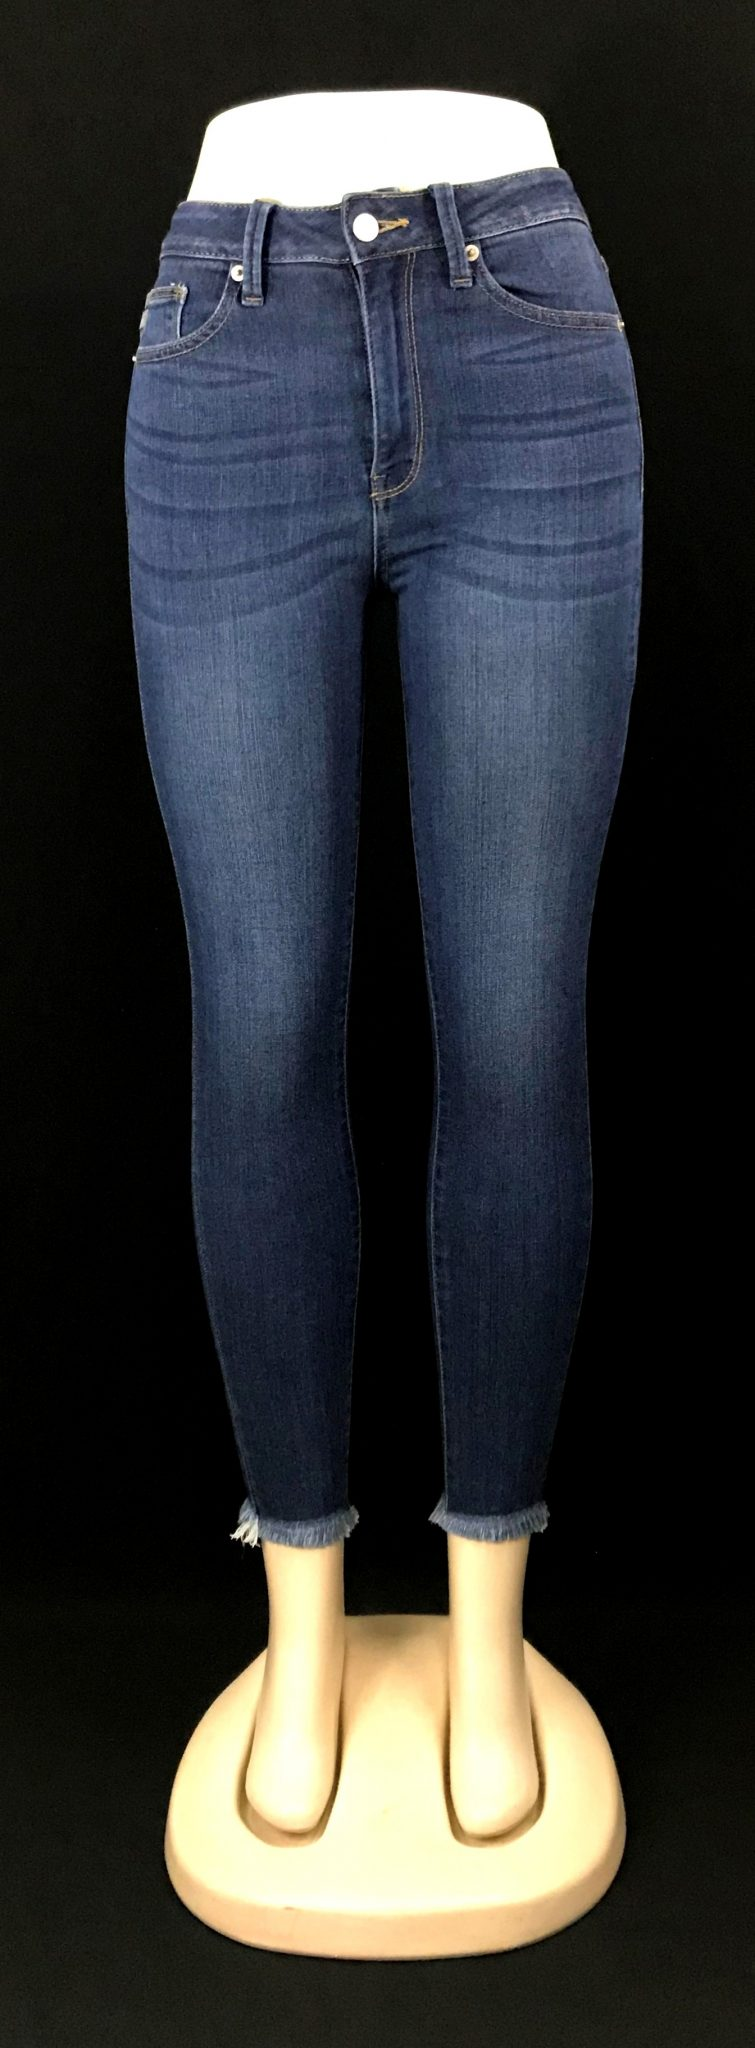 Just Usa Jeans Celeste Con Lavado Denim Republic